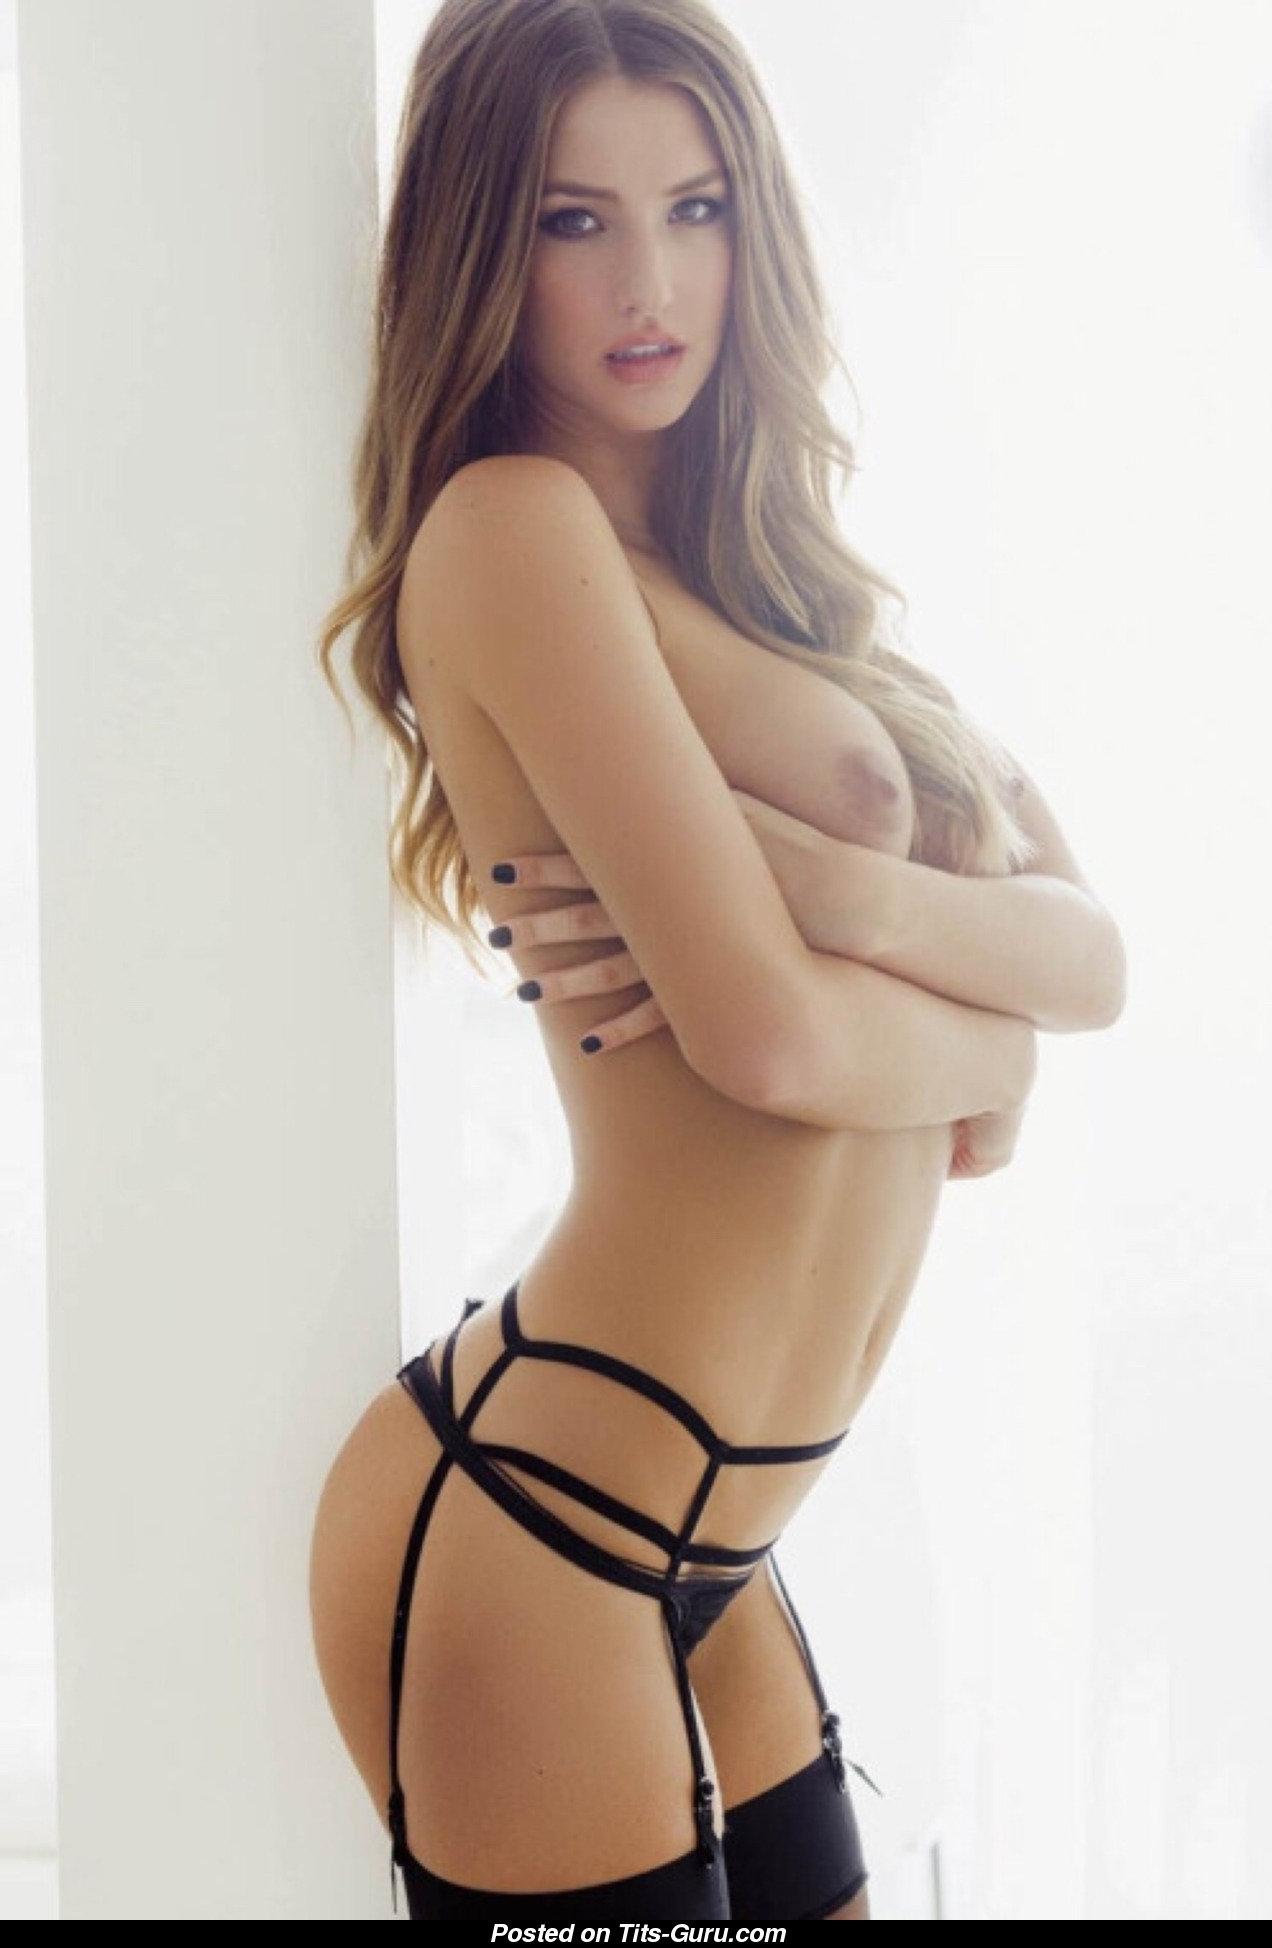 XXX Danica Thrall nudes (43 photos), Sexy, Cleavage, Feet, panties 2018